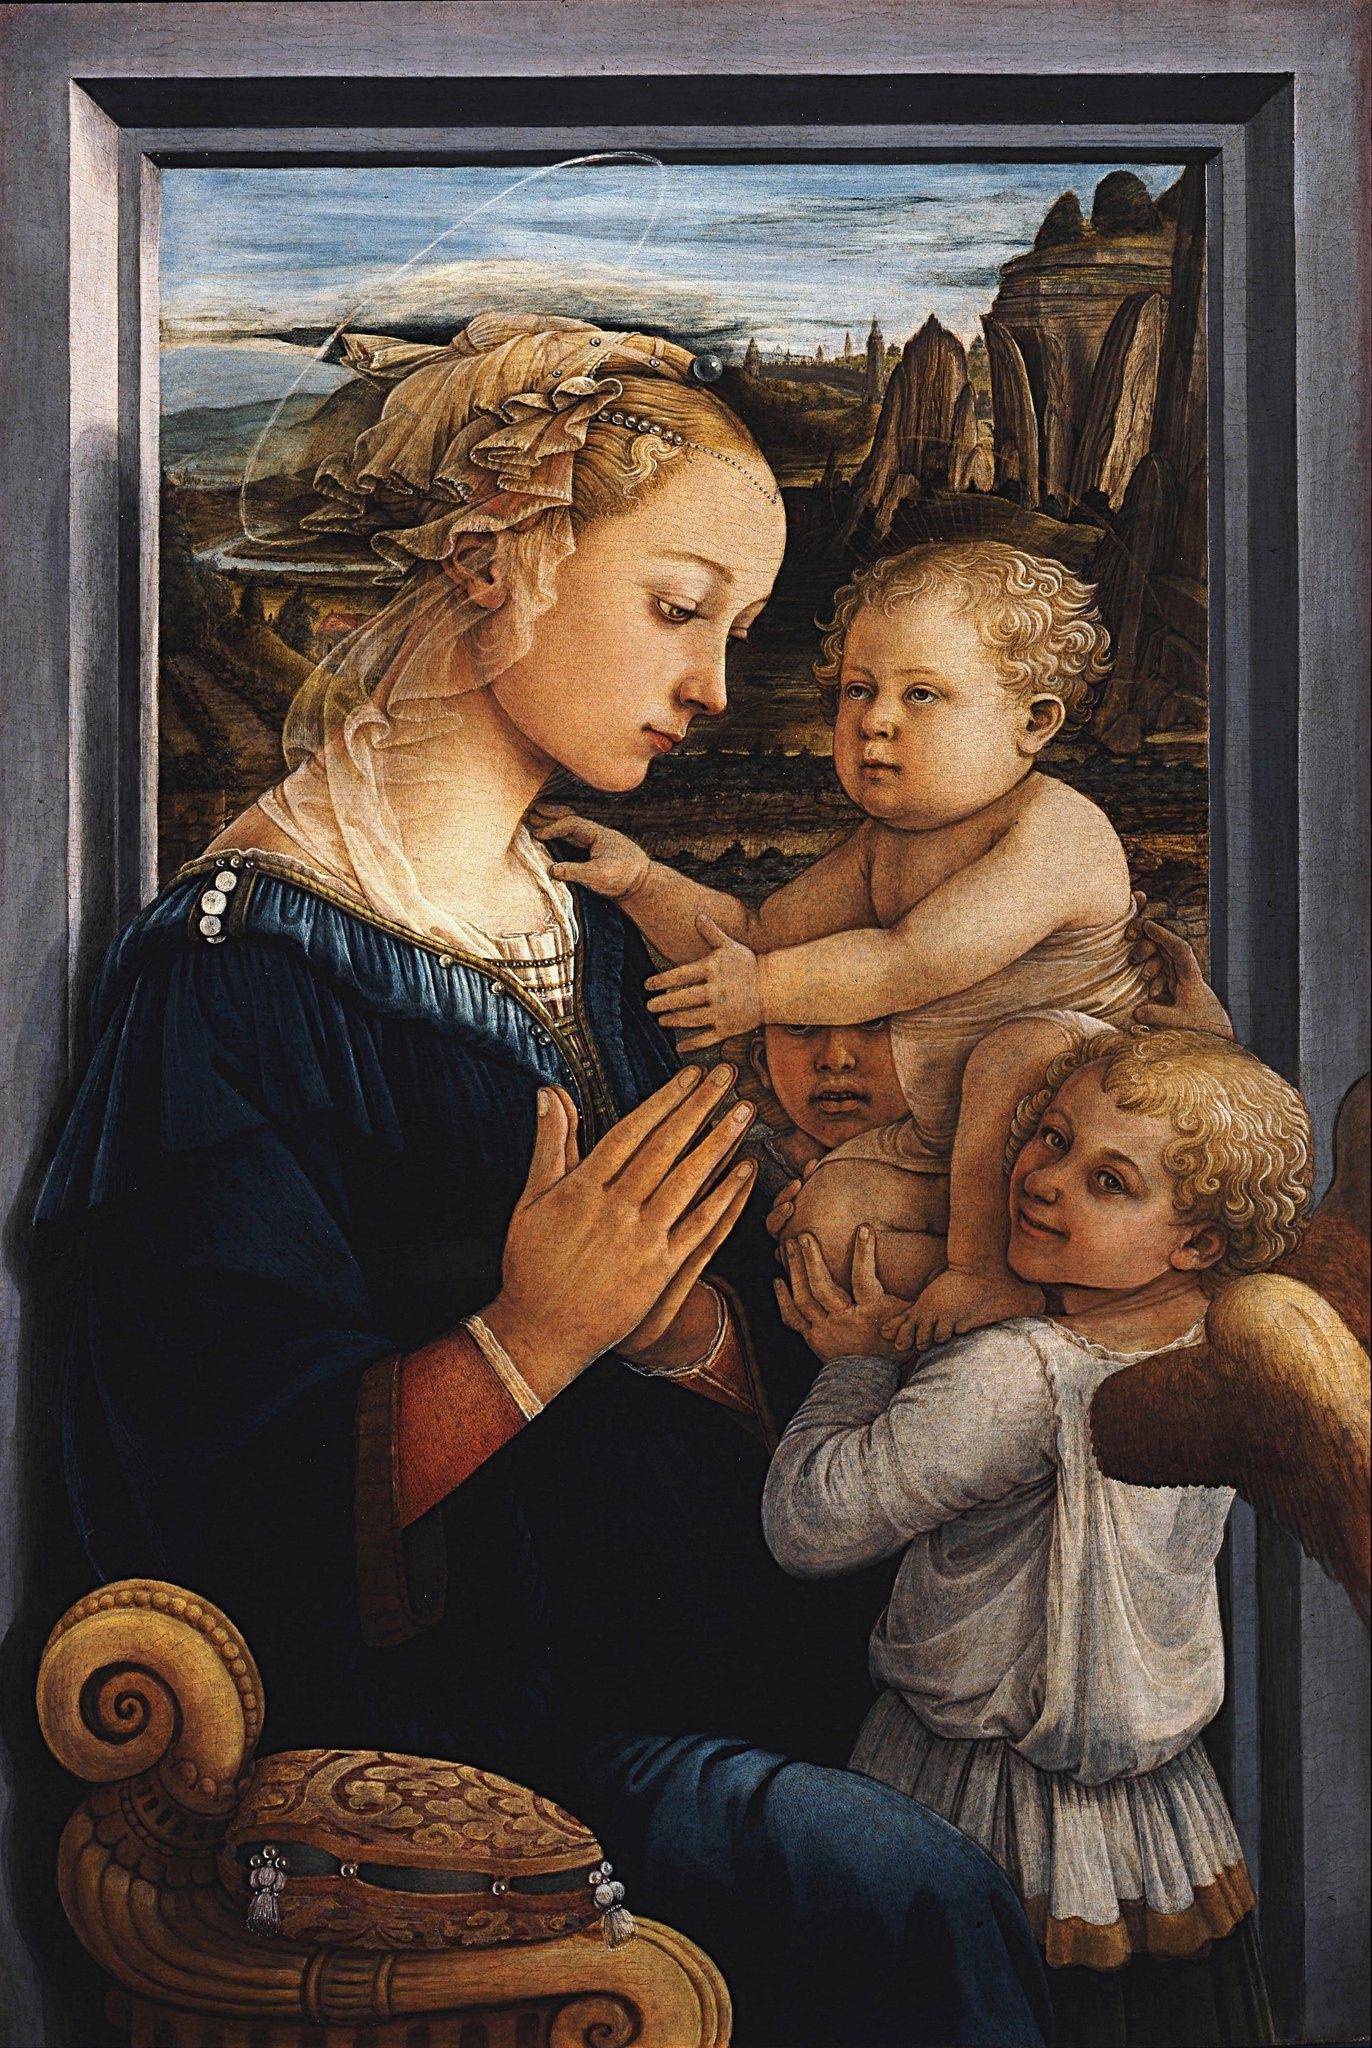 Fra_Filippo_Lippi_-_Madonna_and_Child_with_two_Angels_-_Uffizi